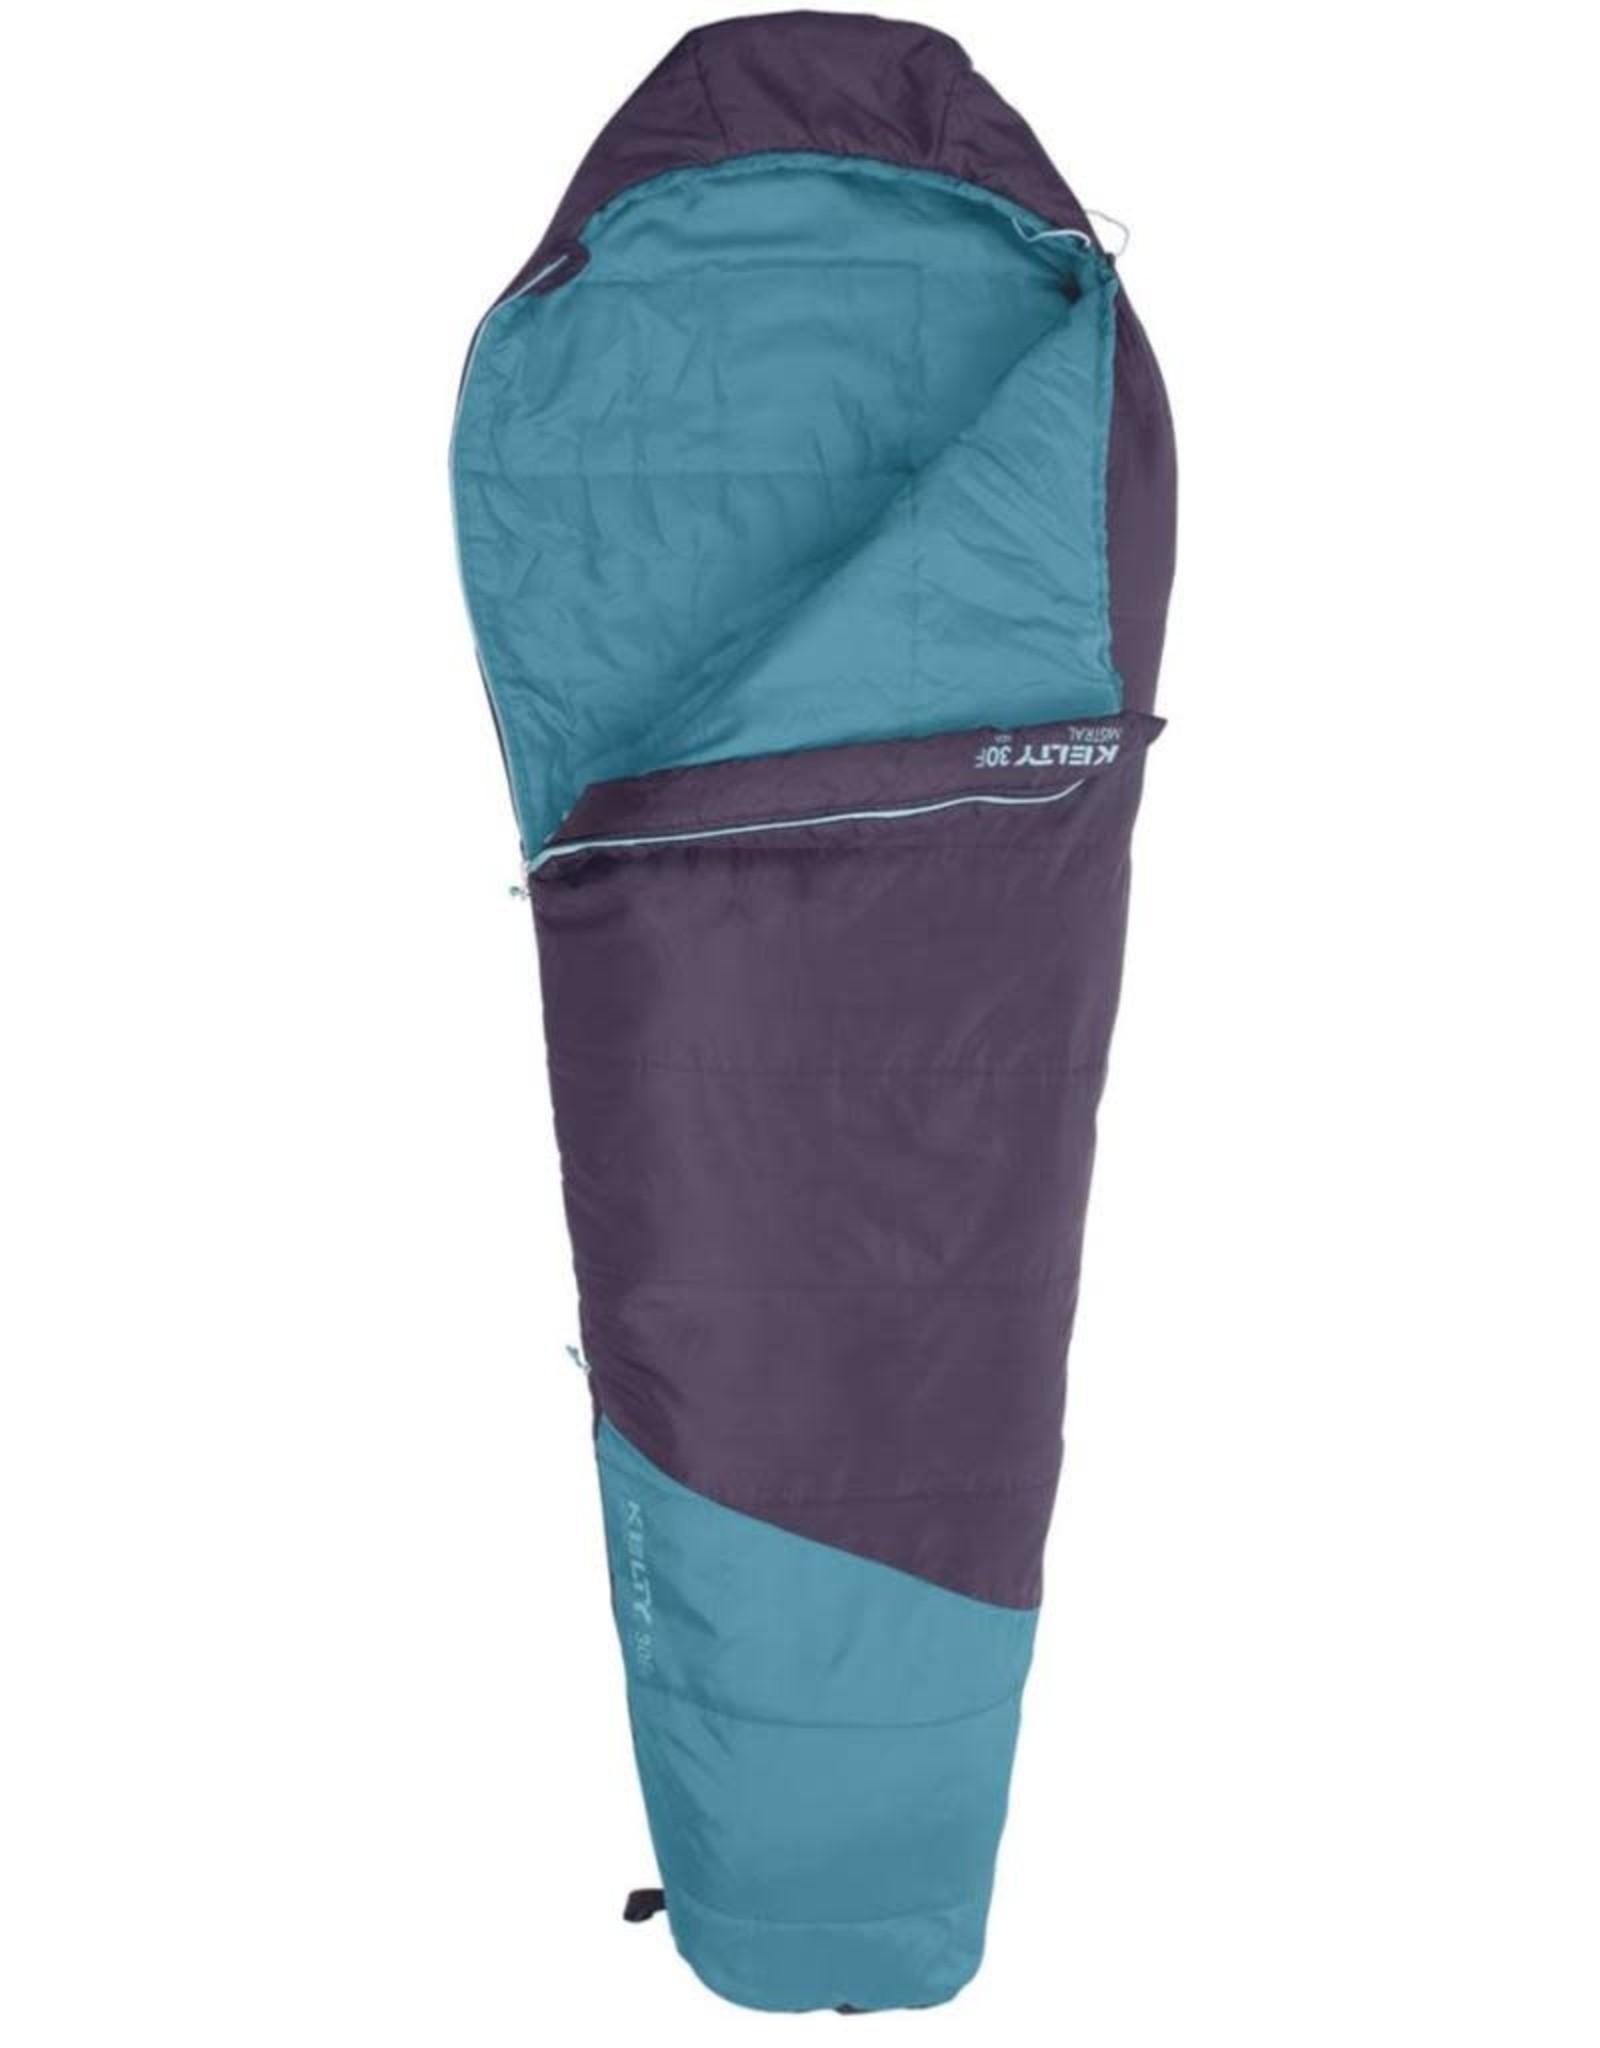 Kelty 30 Degree Kid's Mistral Sleeping Bag